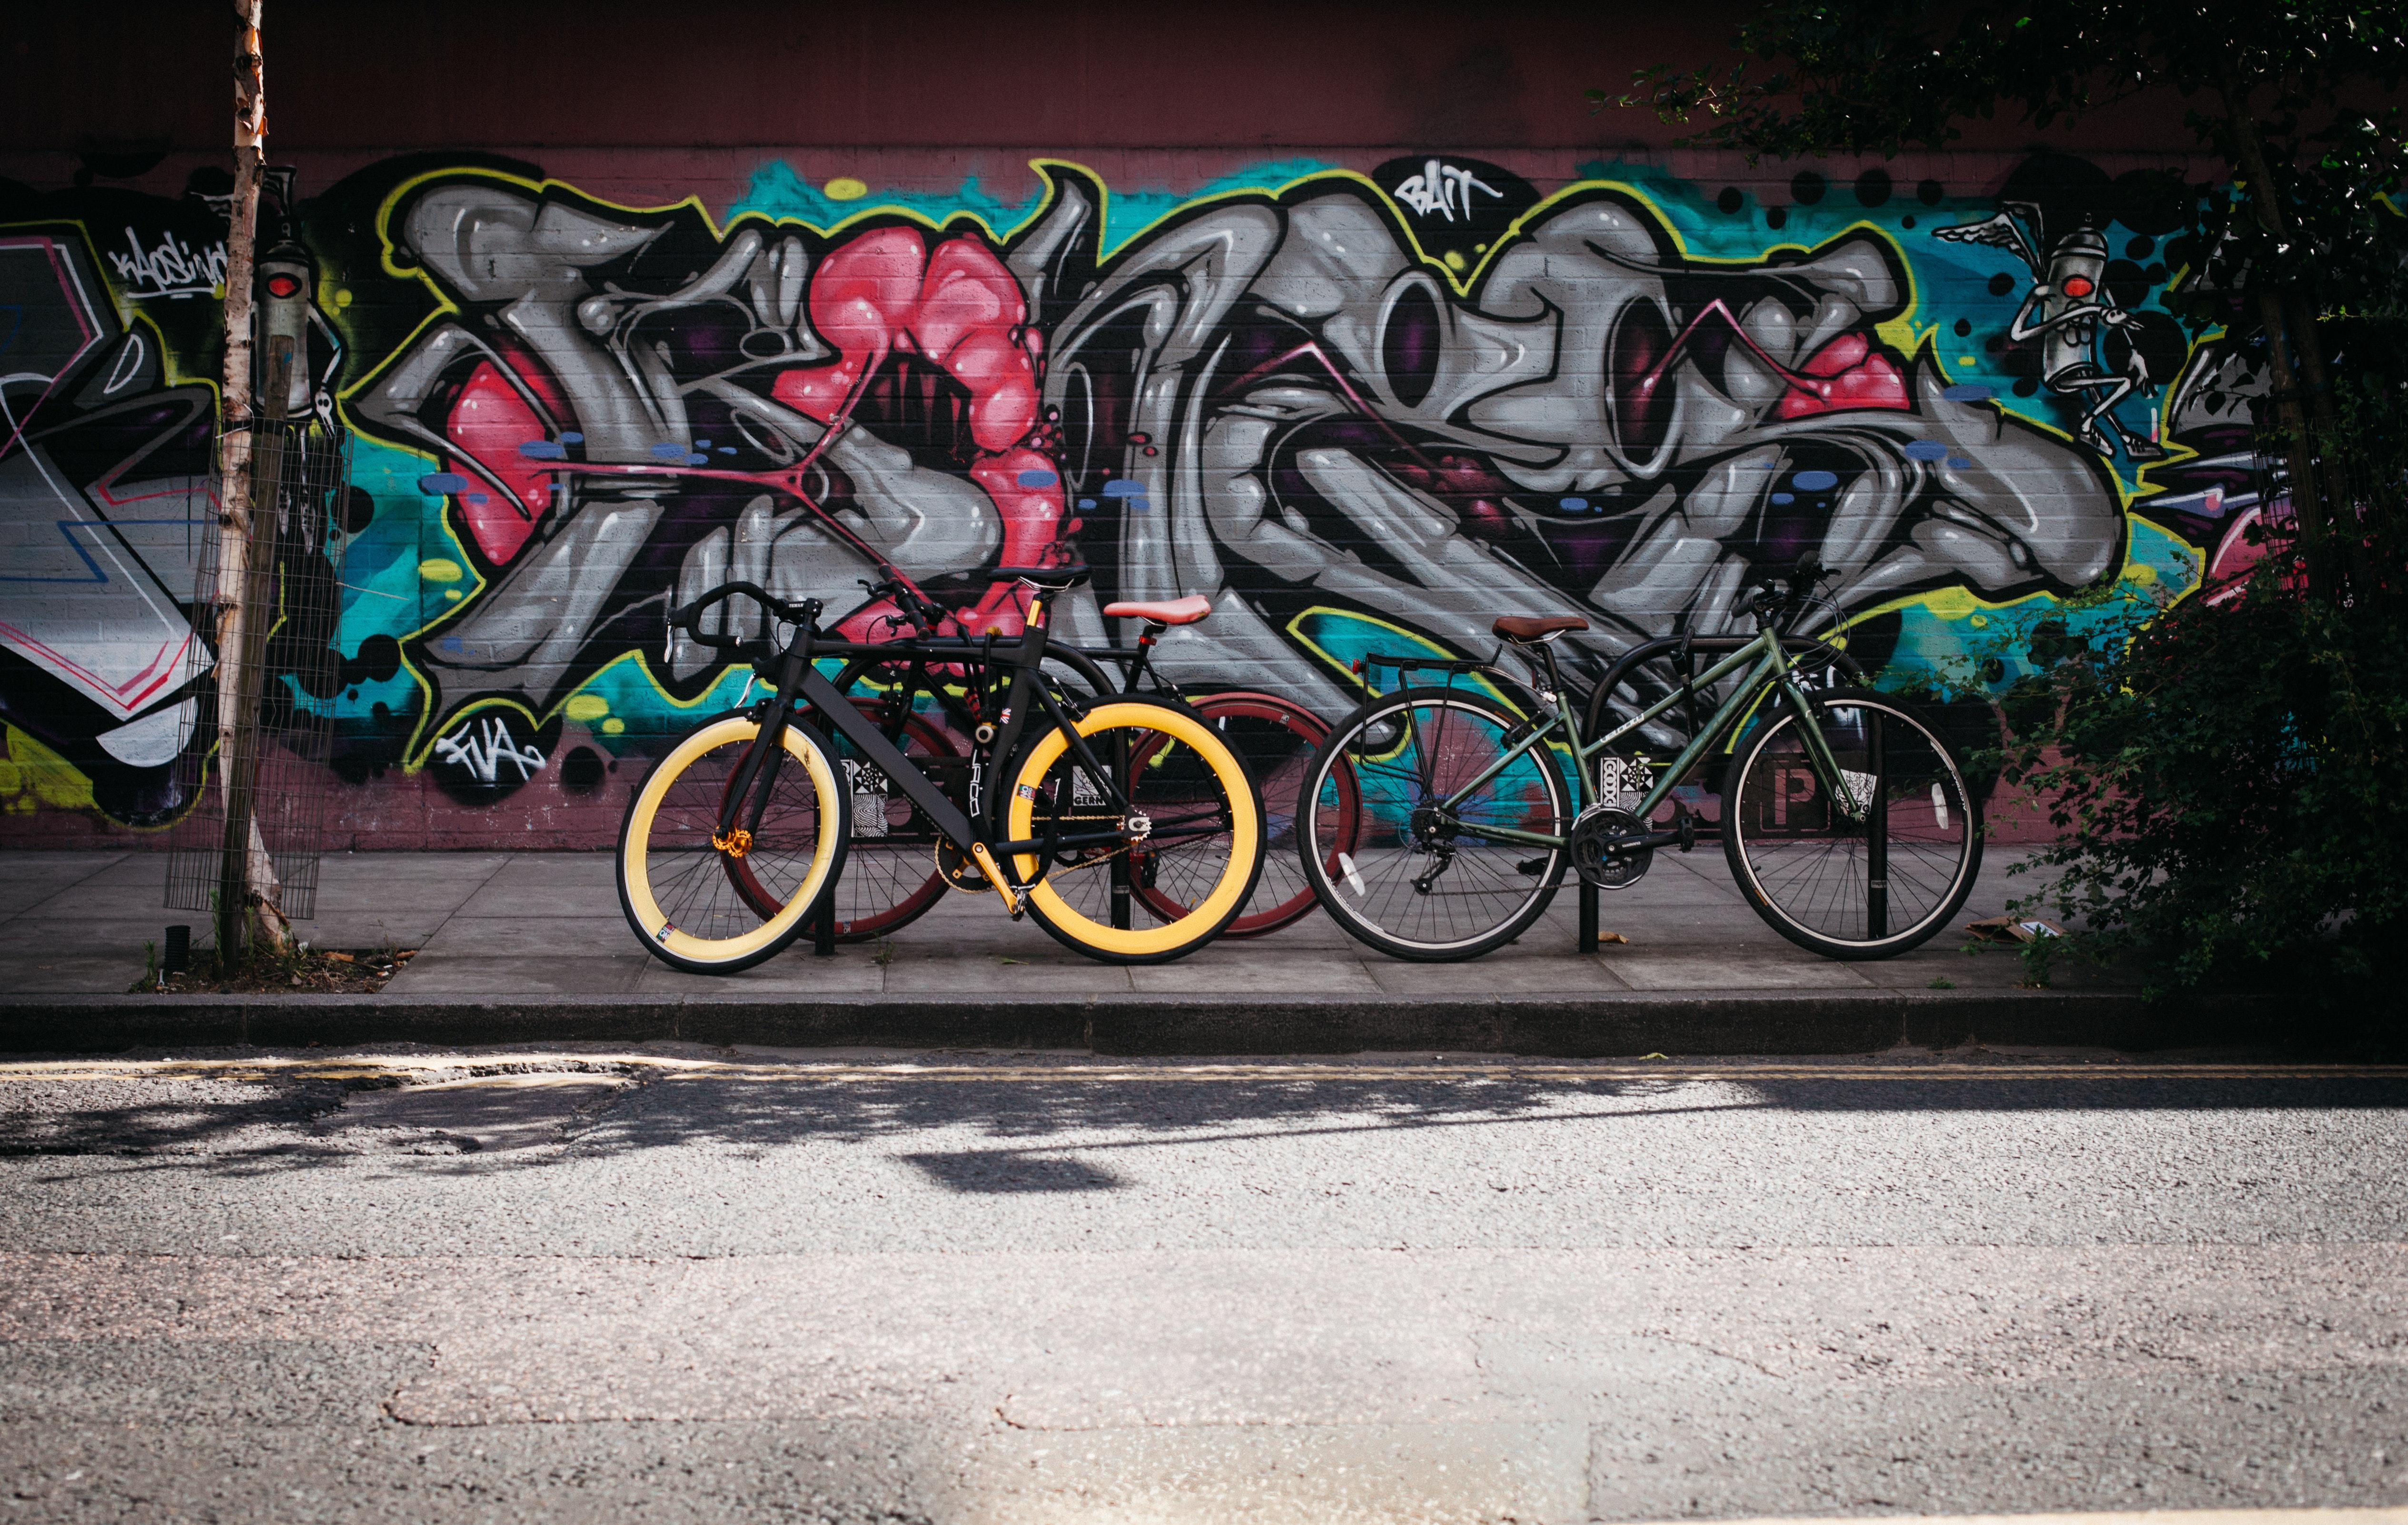 Black and yellow fatbike beside mountain bikes photo